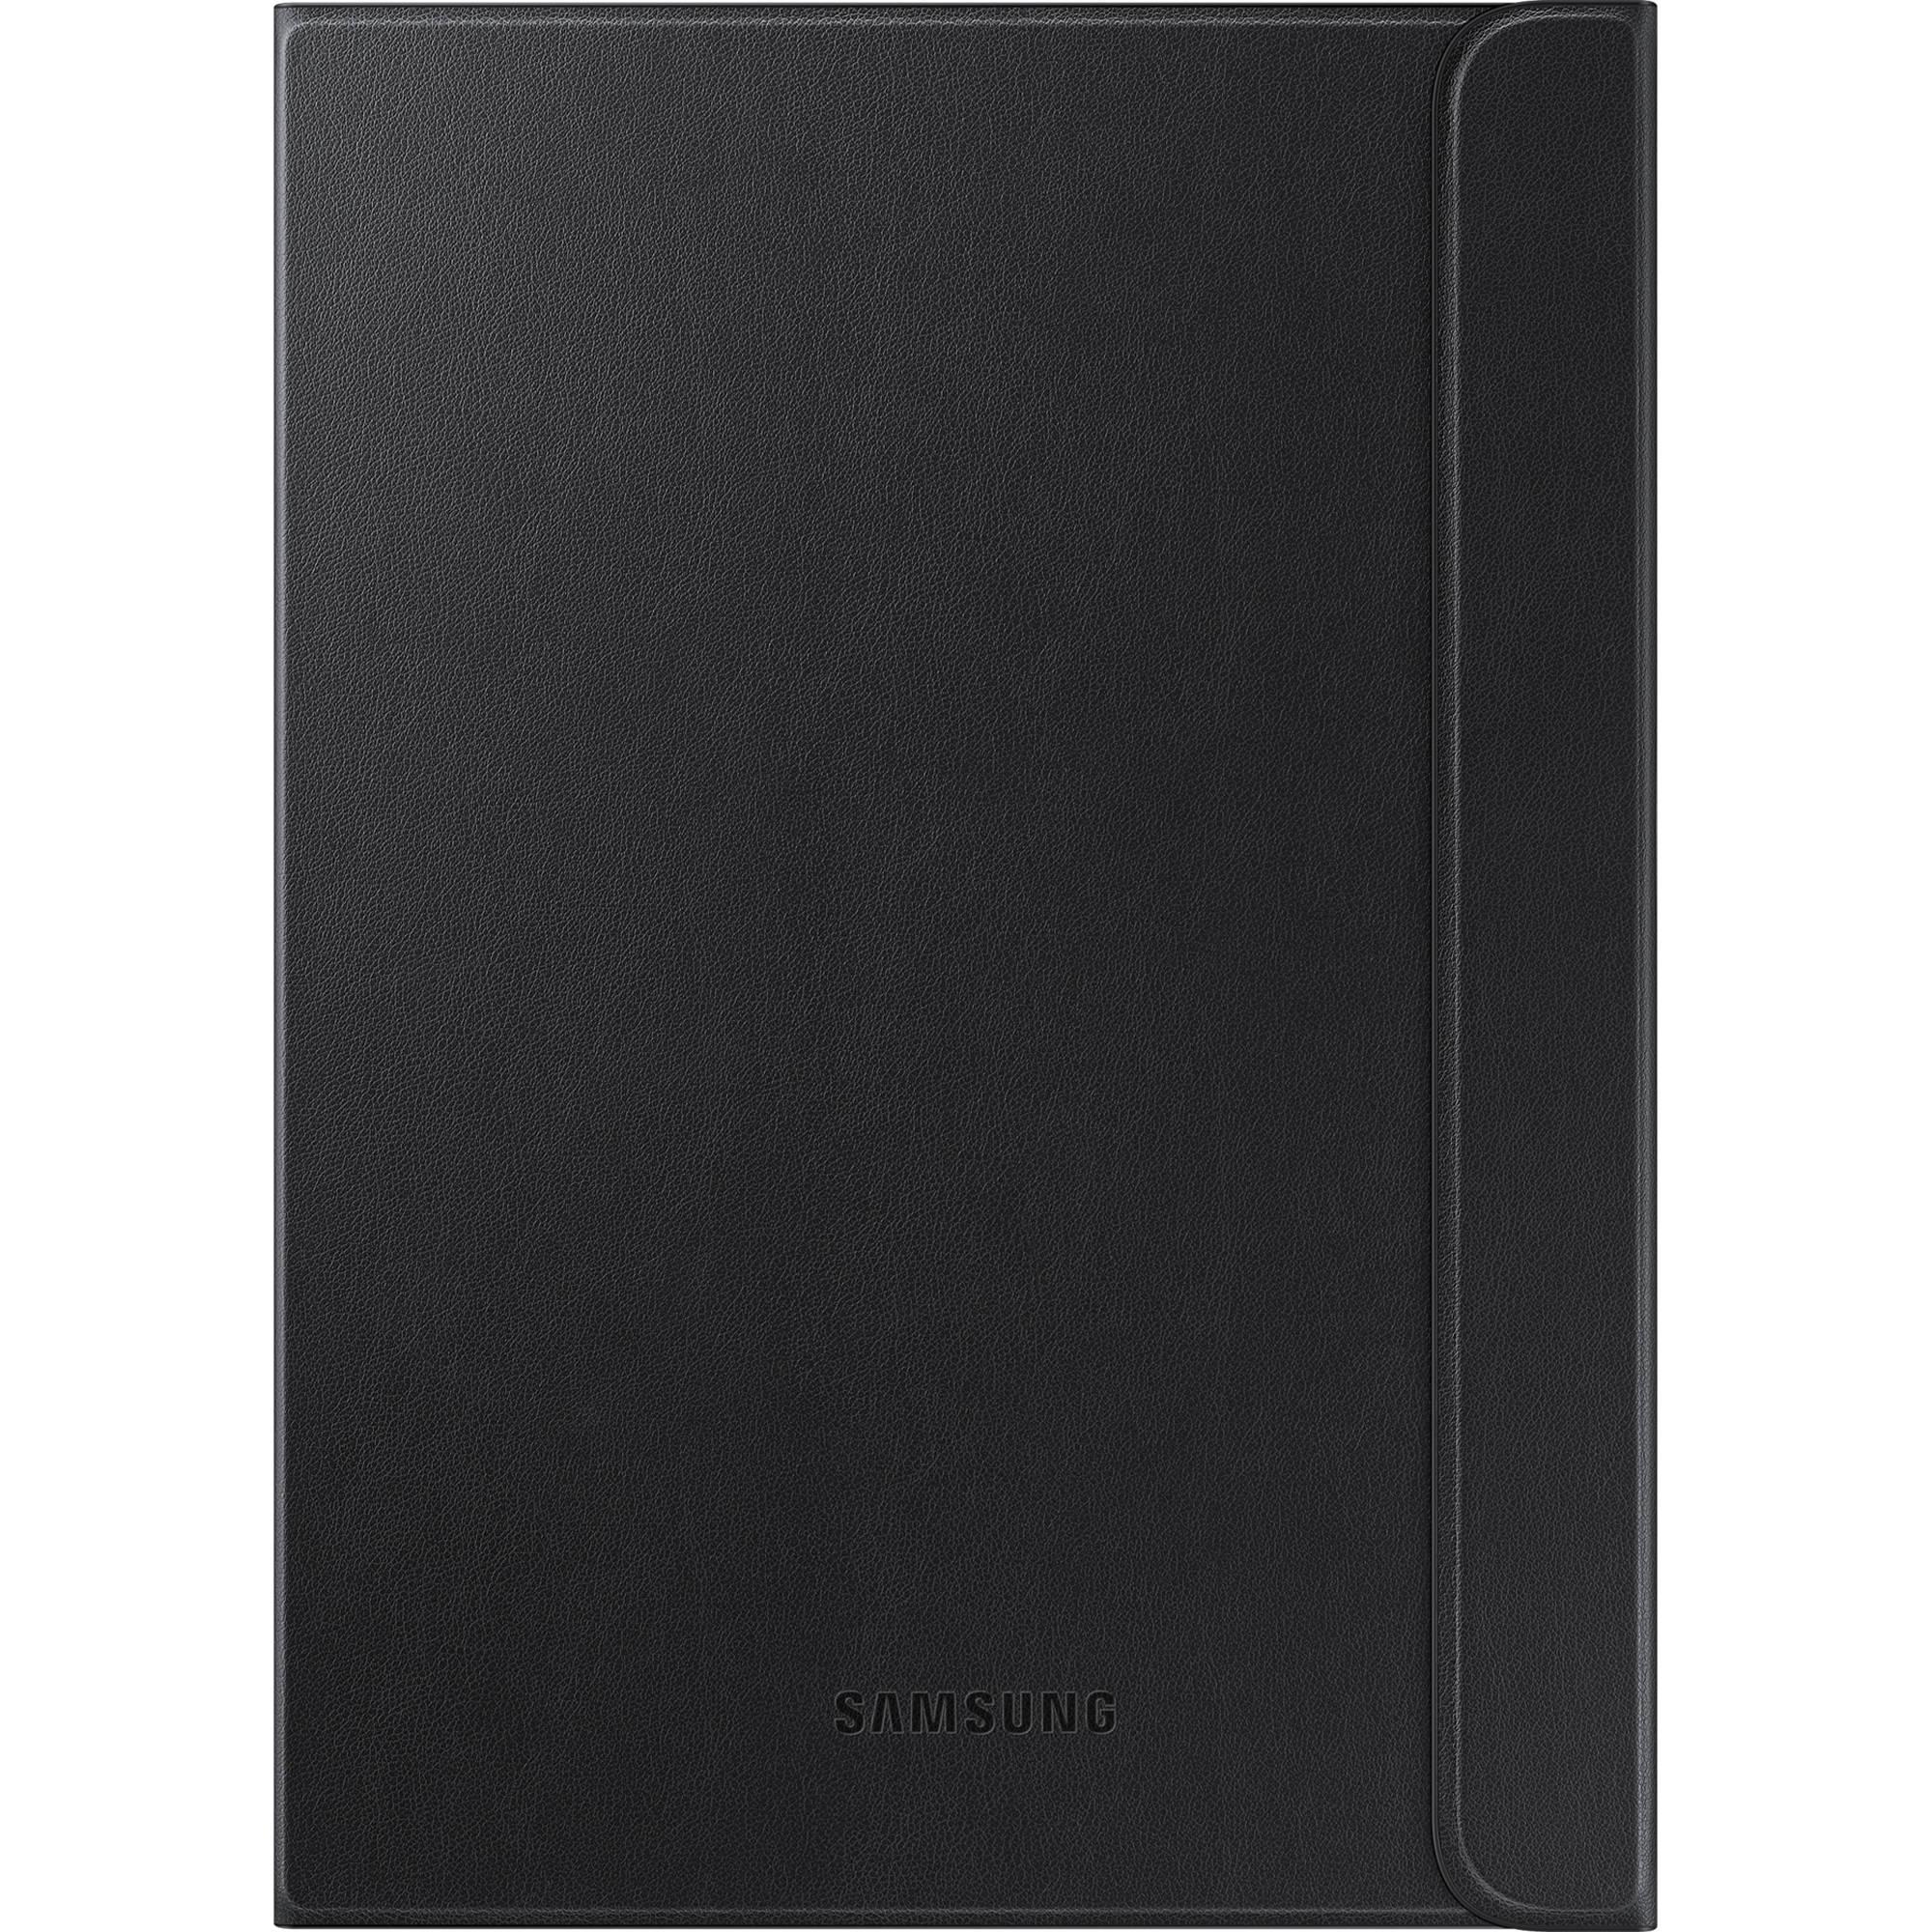 info for fd1ba 16fb3 Samsung Galaxy Tab S2 9.7 Book Cover (Black)